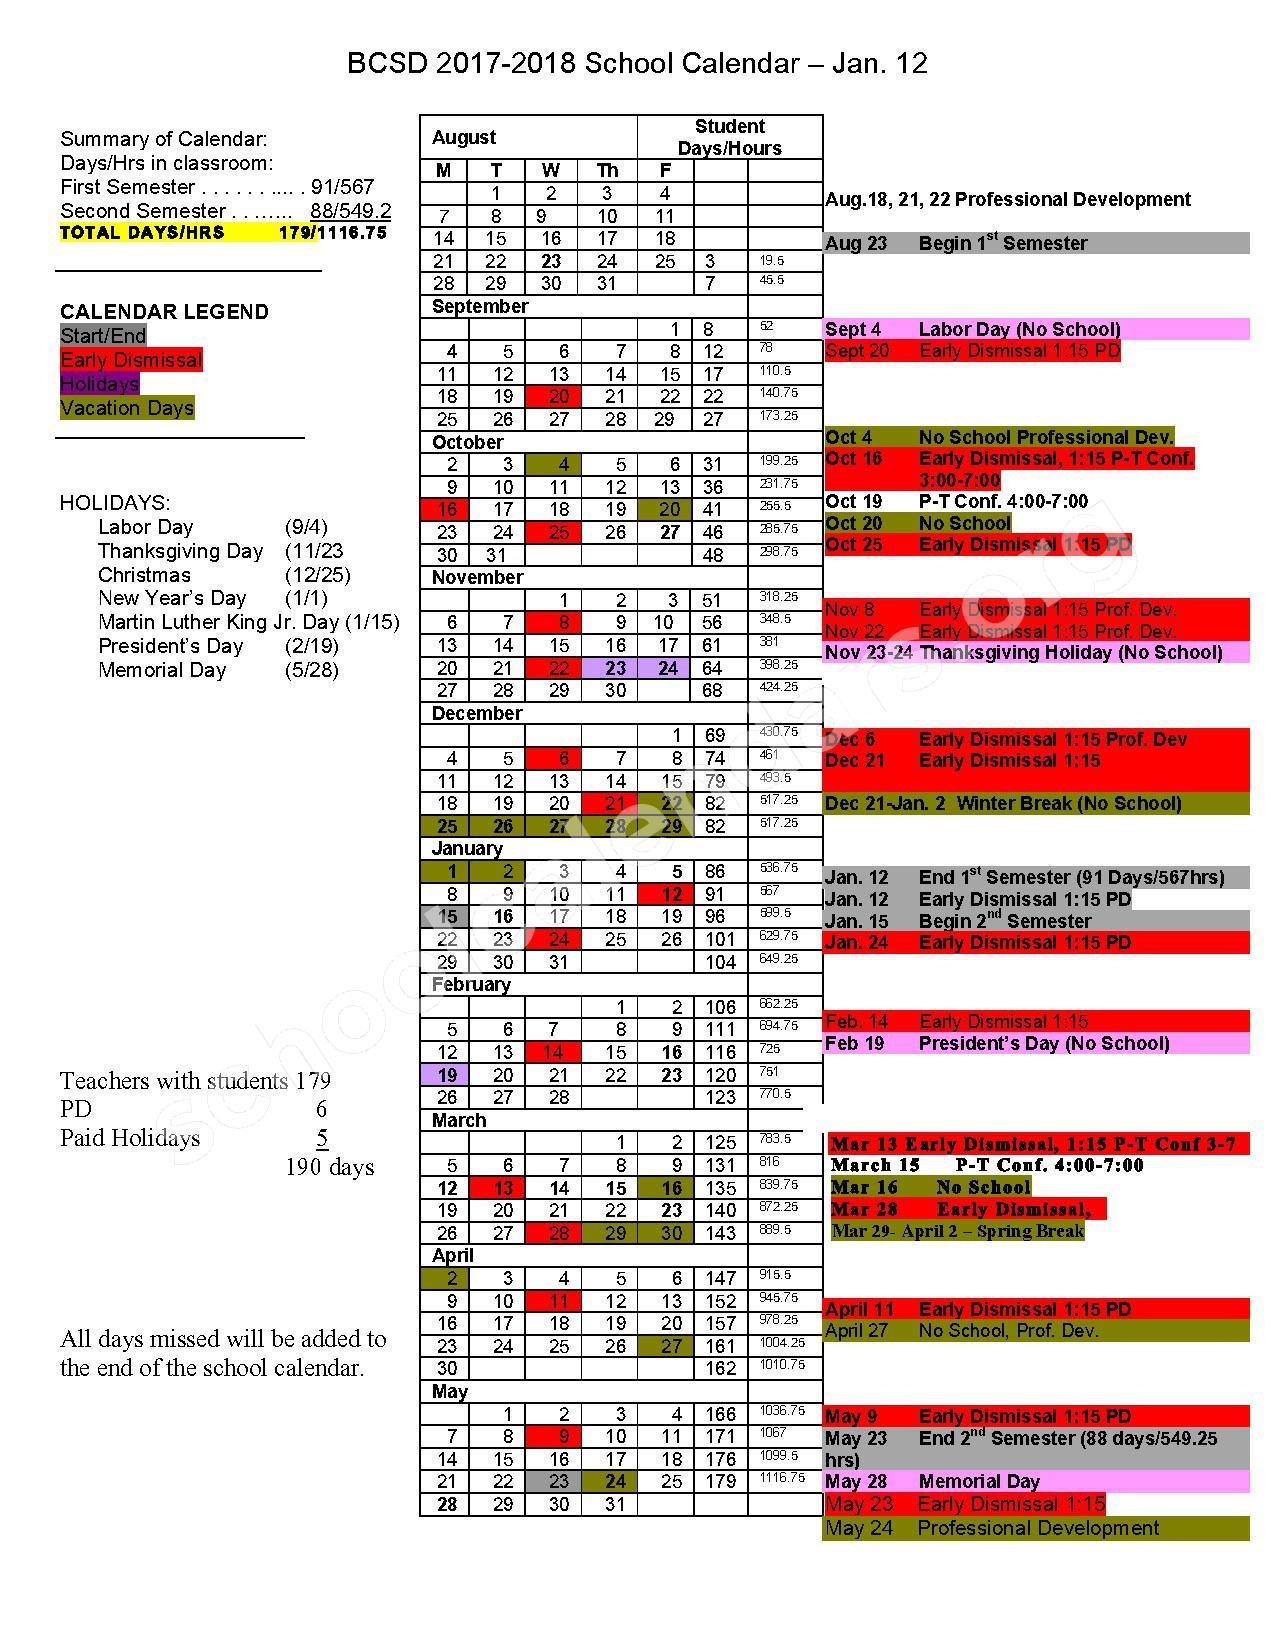 2017 - 2018 School Calendar – Bedford Community School District – page 1